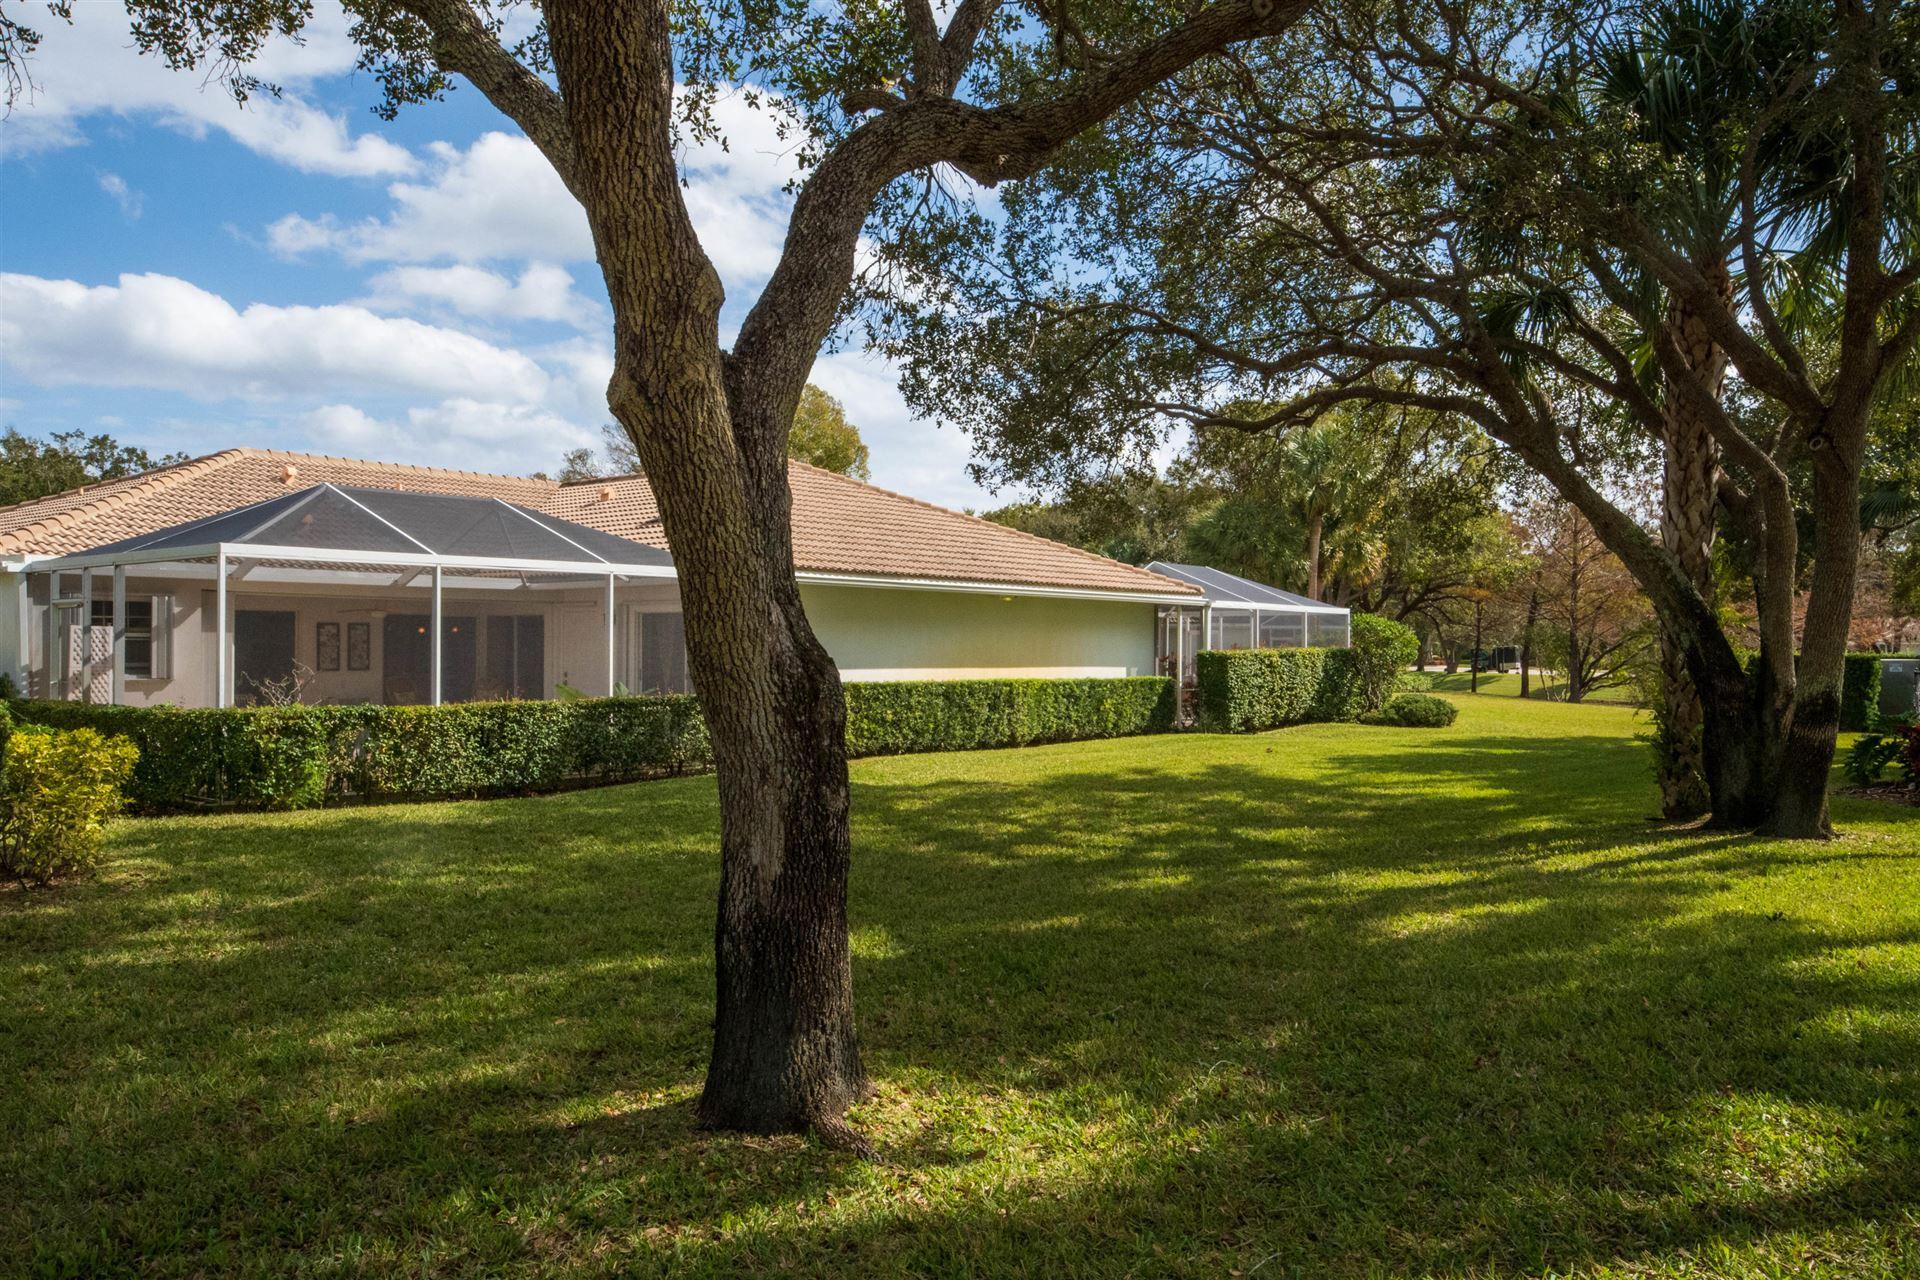 Photo of 701 Silverleaf Oak Court, Palm Beach Gardens, FL 33410 (MLS # RX-10683141)